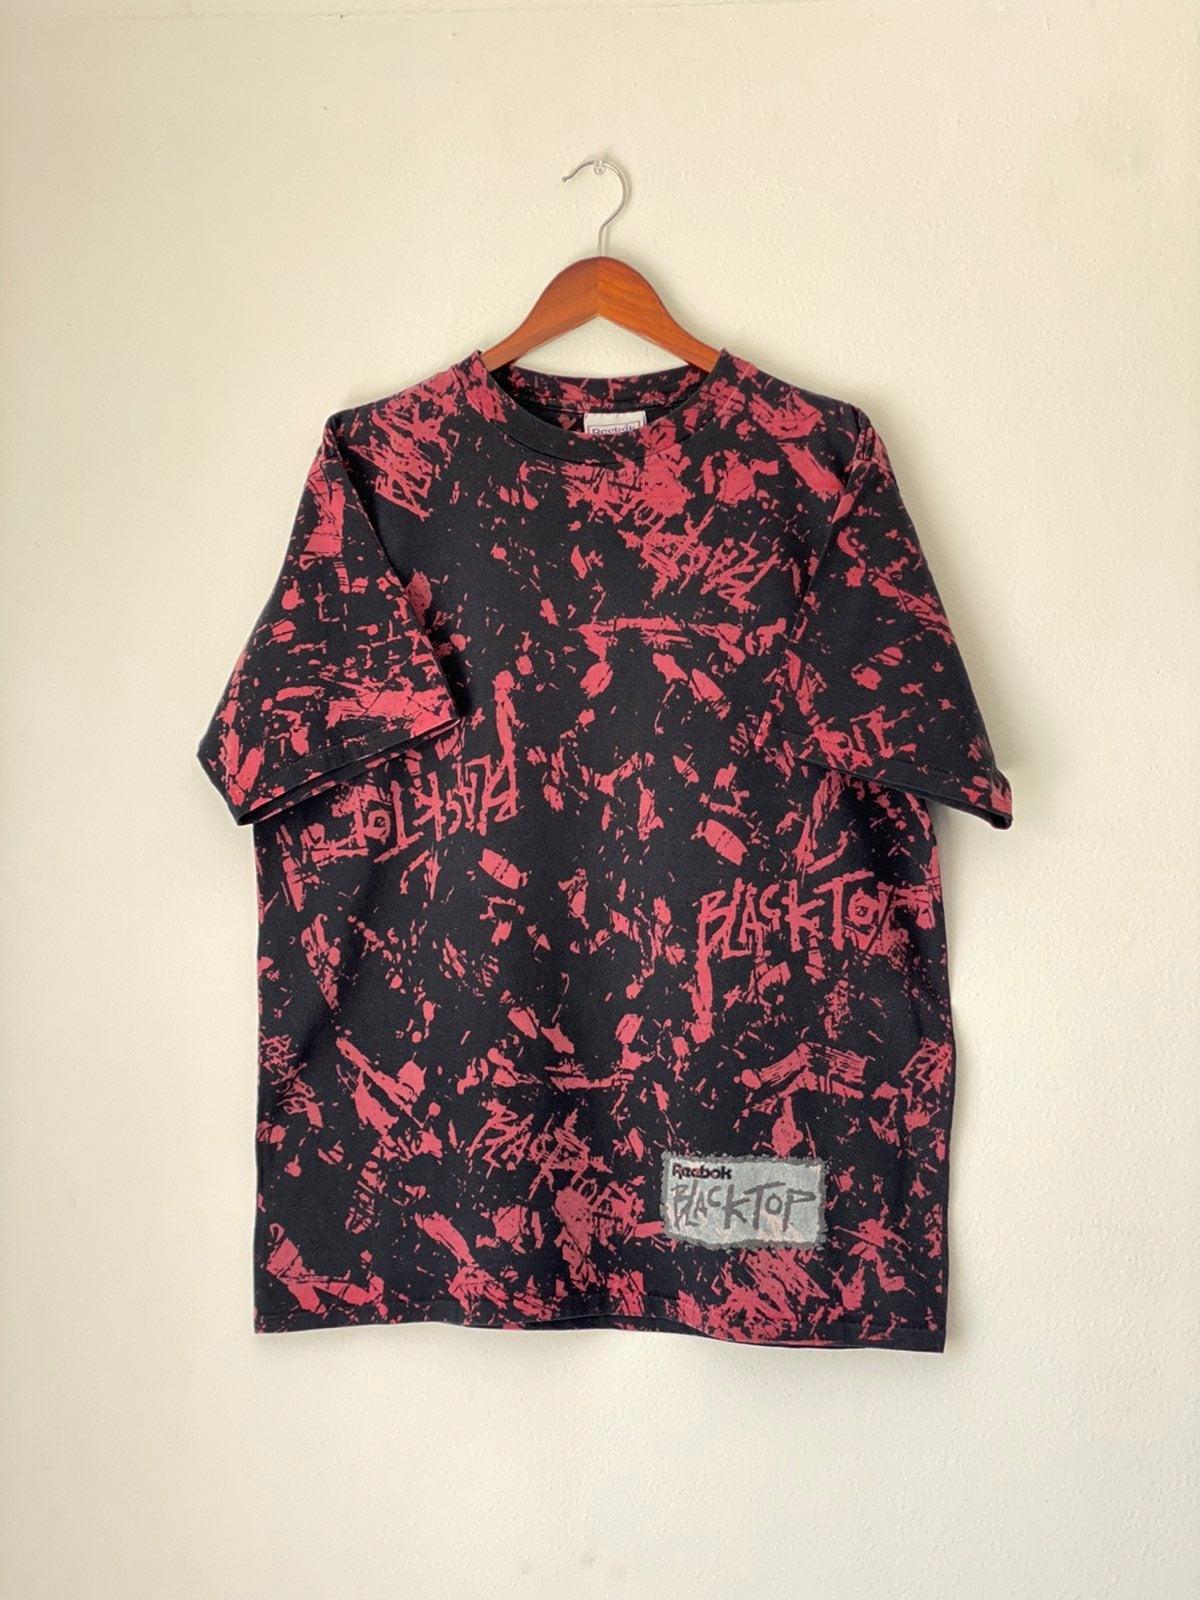 Vtg 90s Reebok Blacktop Shirt Sz L